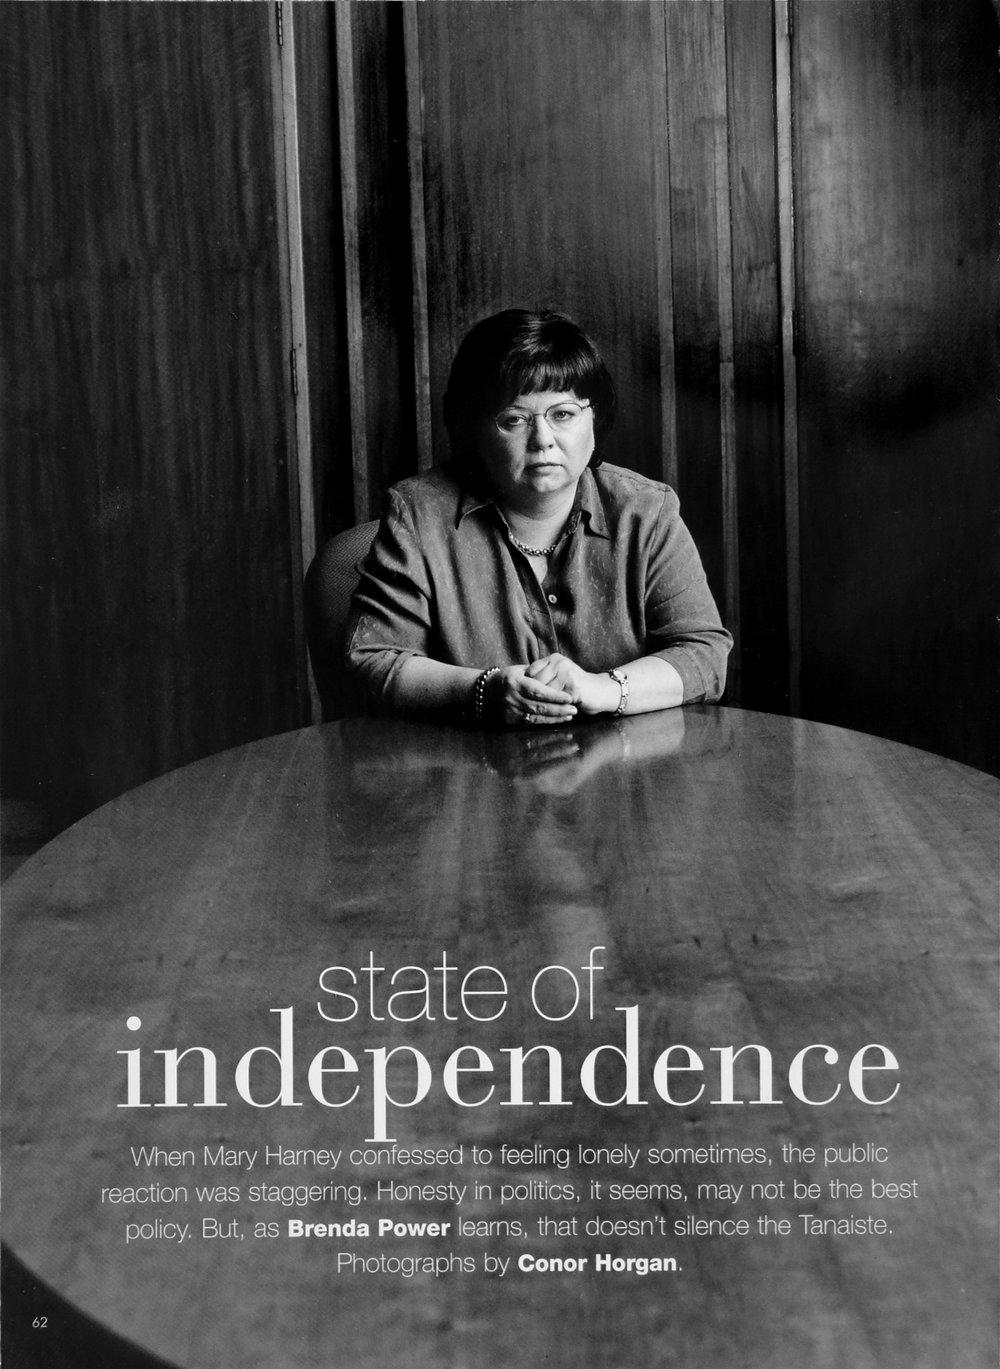 Mary Harney, leader of the Progressive Democrats, for Image Magazine.